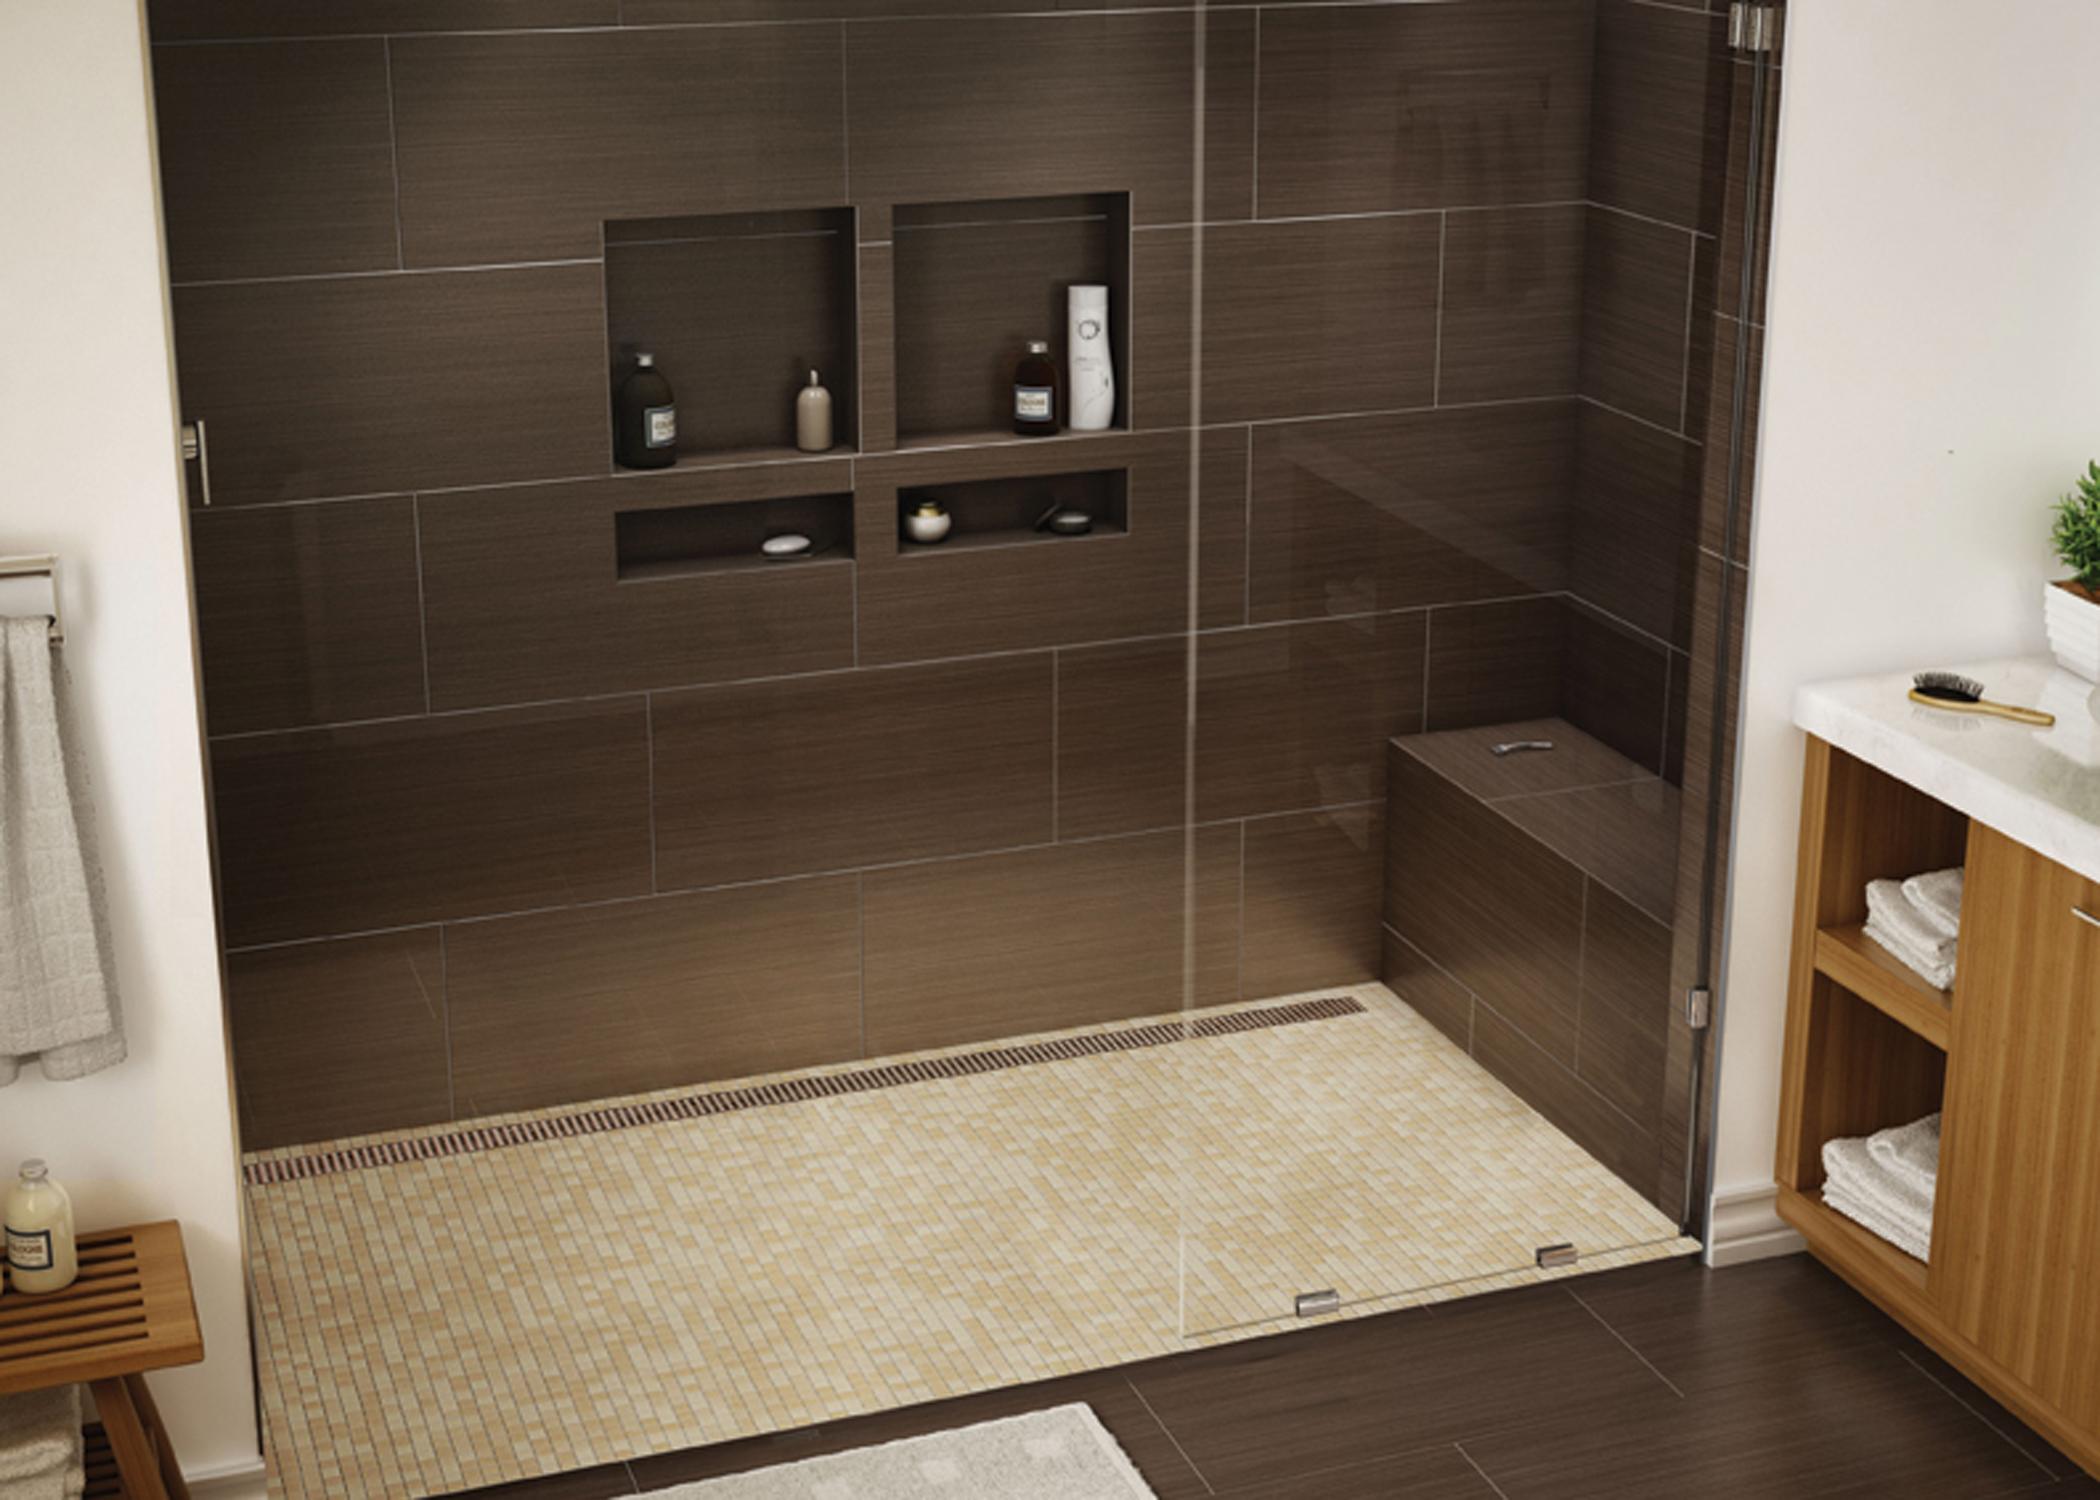 Tile Redi Shower Bases | Pro Remodeler